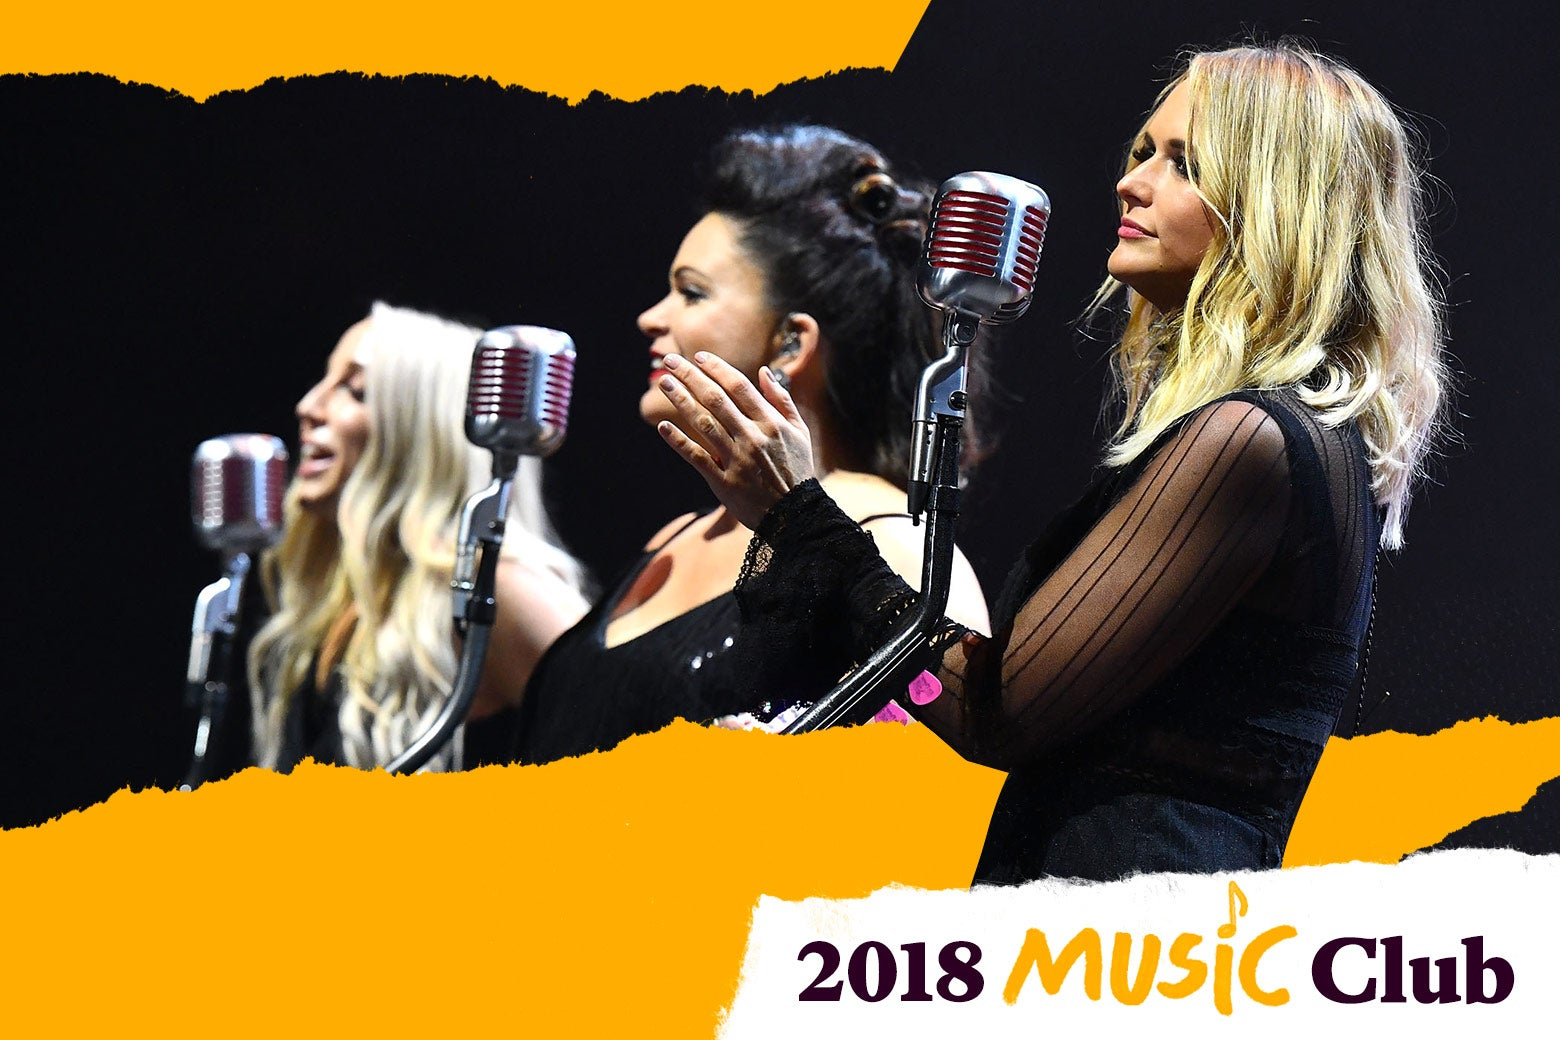 Miranda Lambert, Ashley Monroe, and Angaleena Presley of the Pistol Annies.